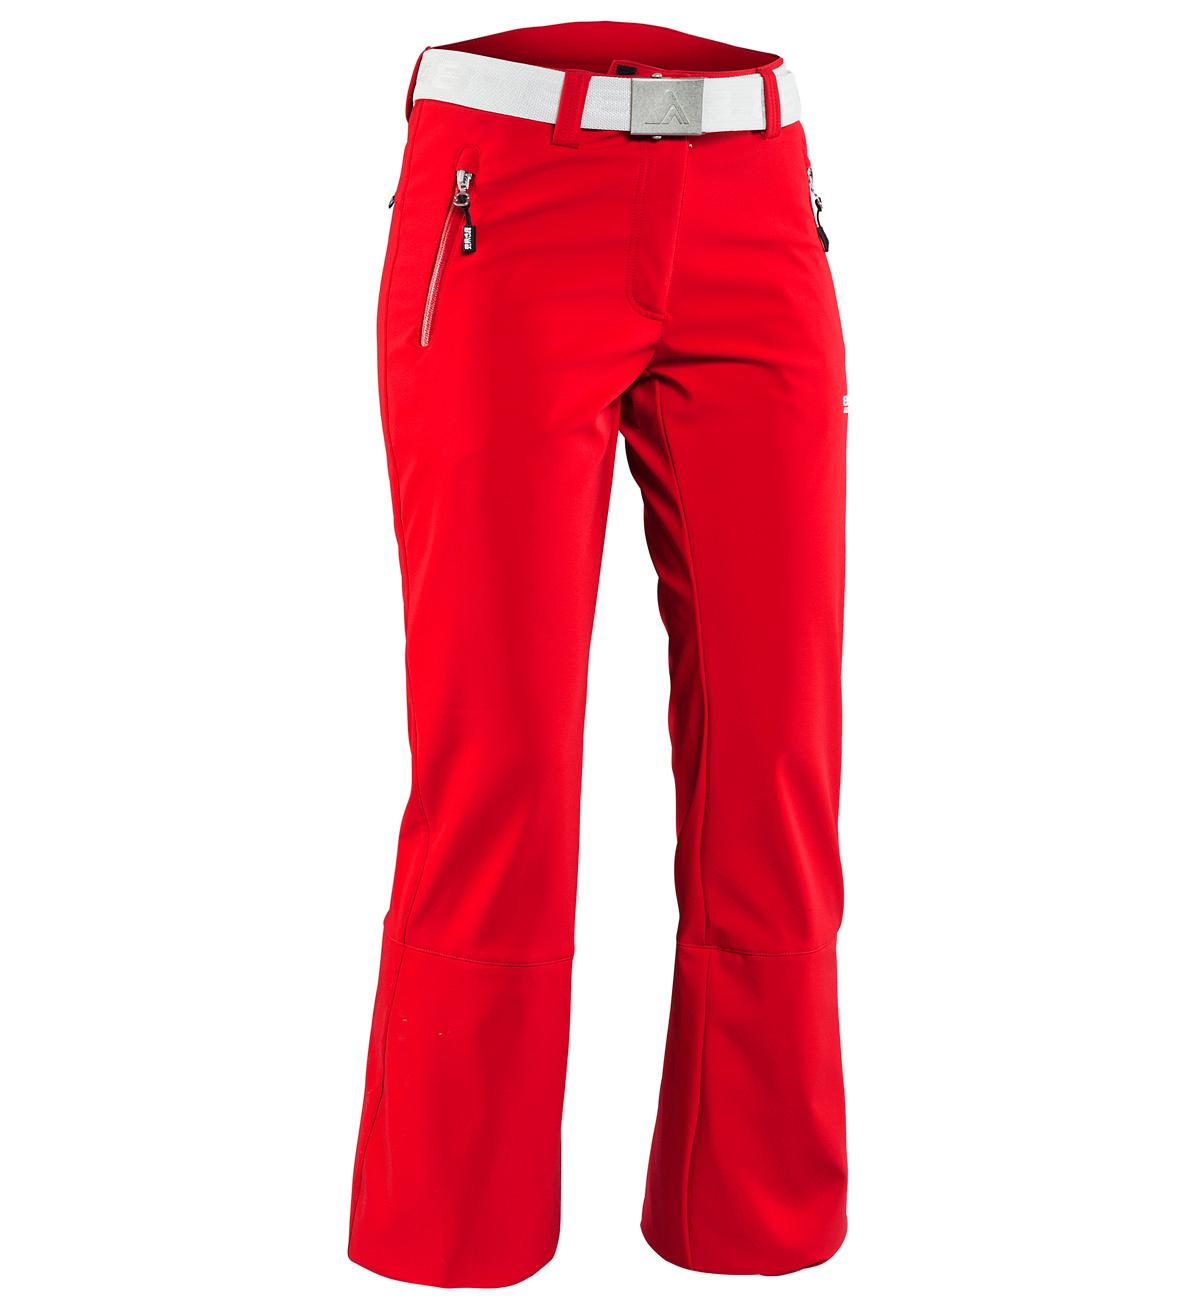 Брюки горнолыжные 8848 Altitude SPIN SOFTSHELL женские Red